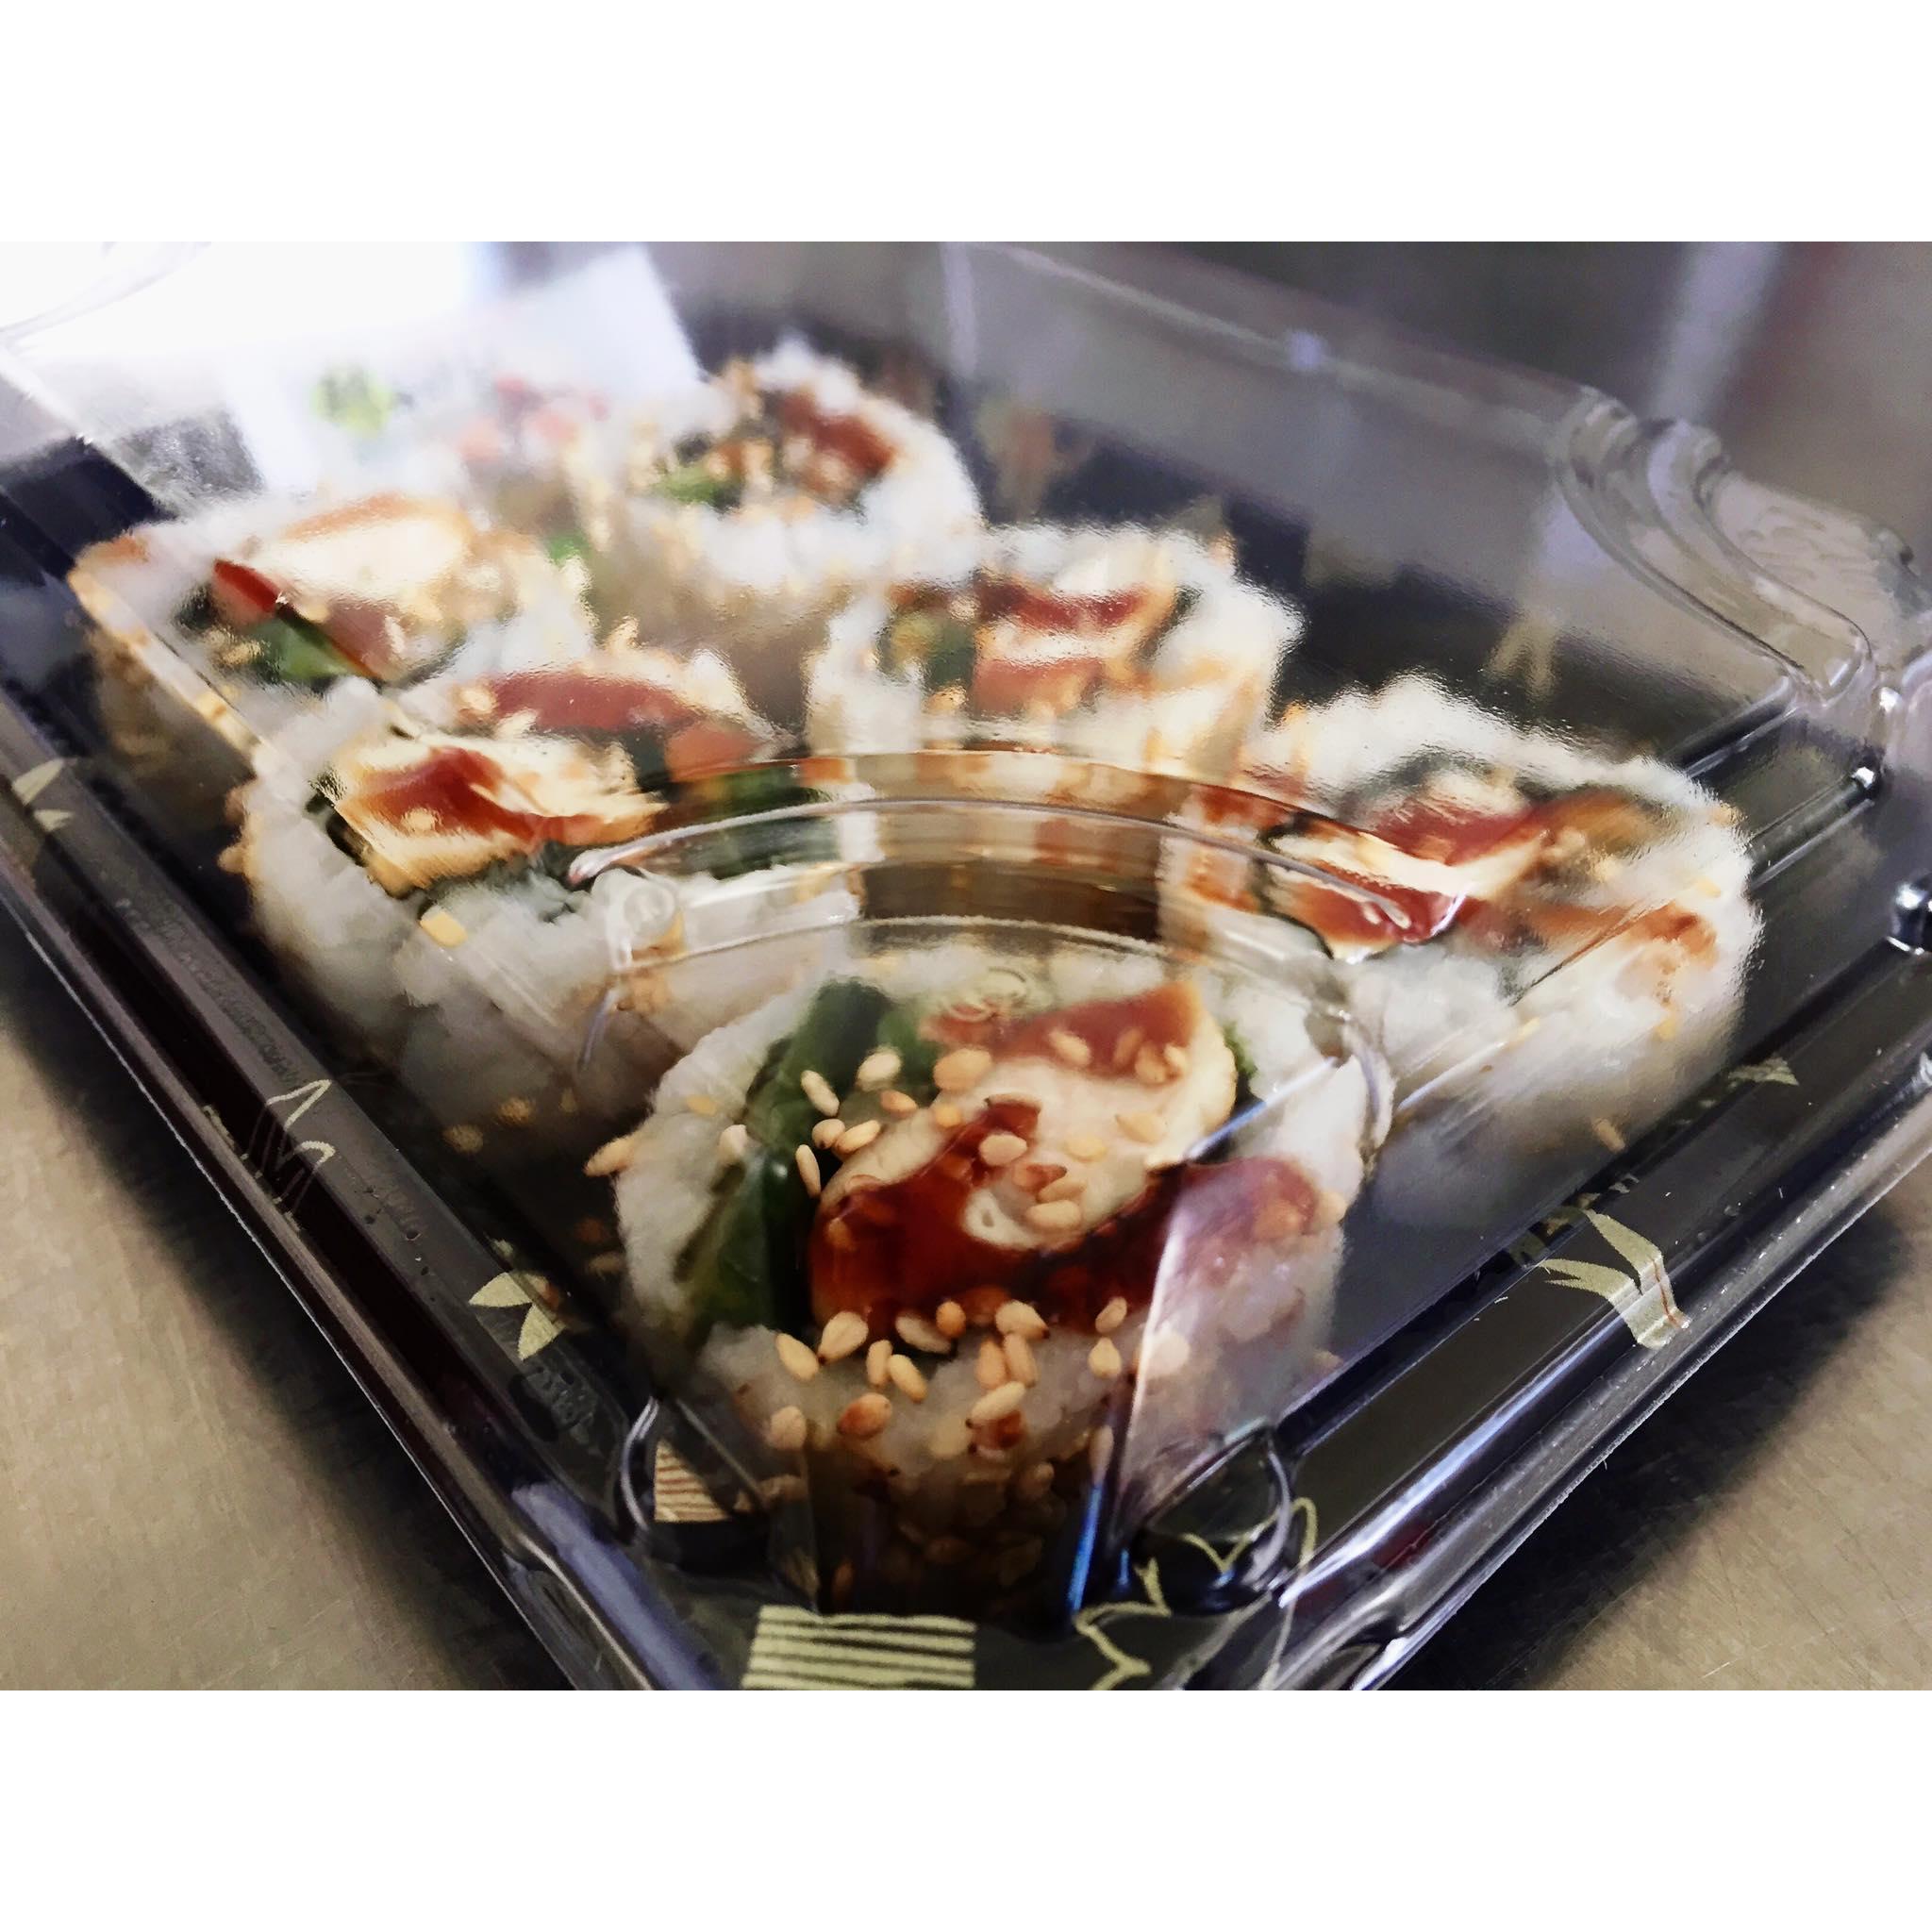 TERIYAKI CHICKEN SUSHI ROLL - £5.50